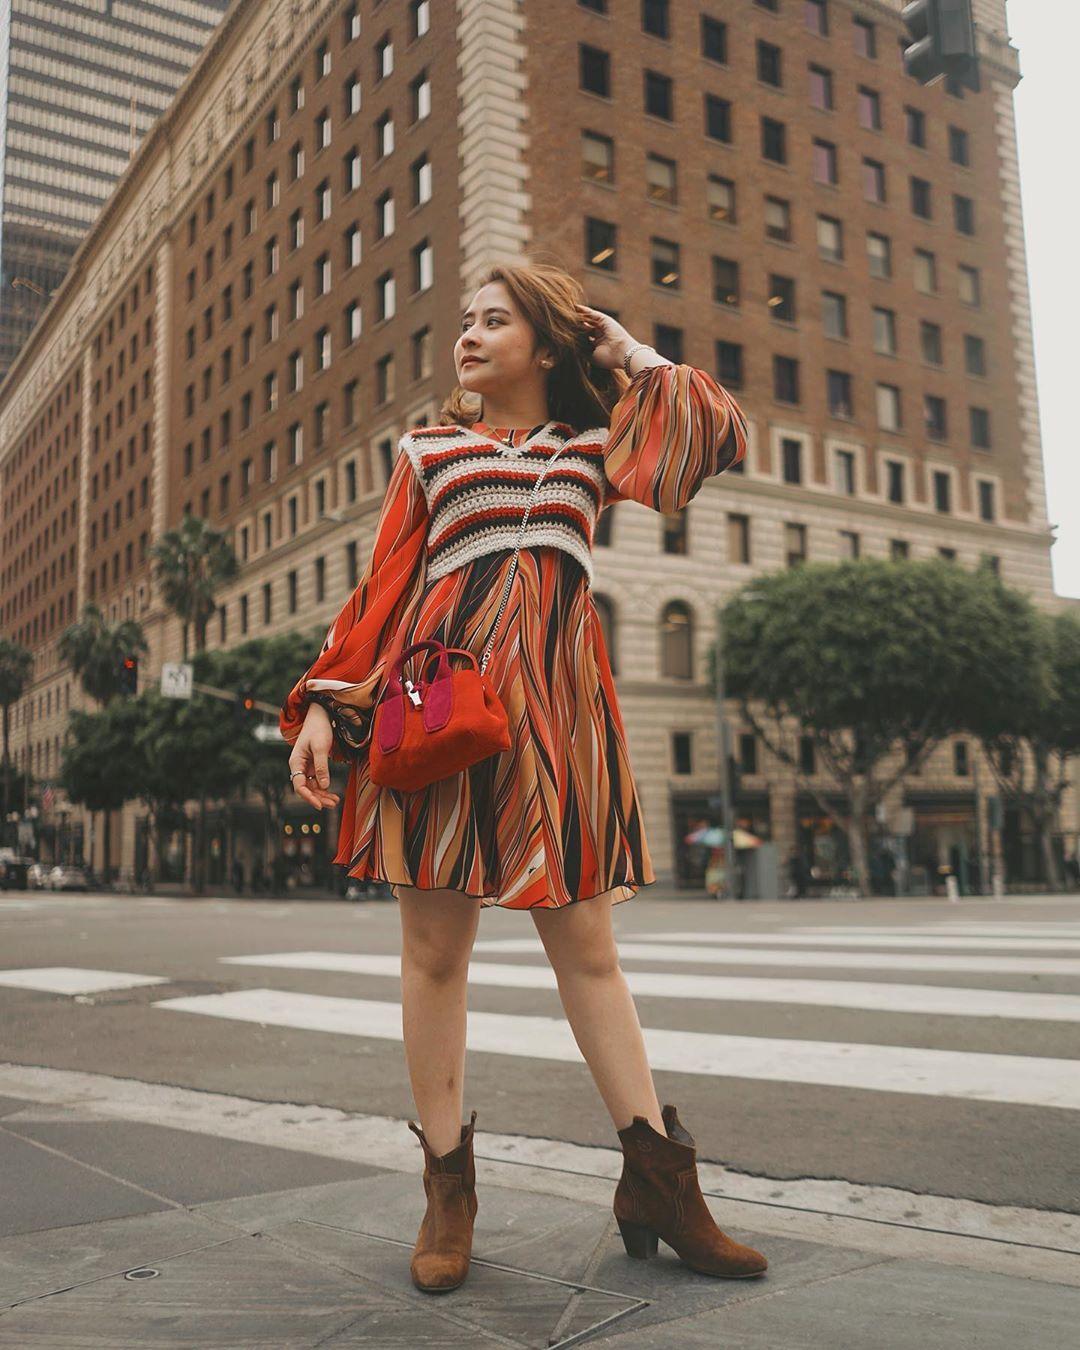 Harga Fashion Item Mahal Prilly Latuconsina, 10 Juta Ke Atas!